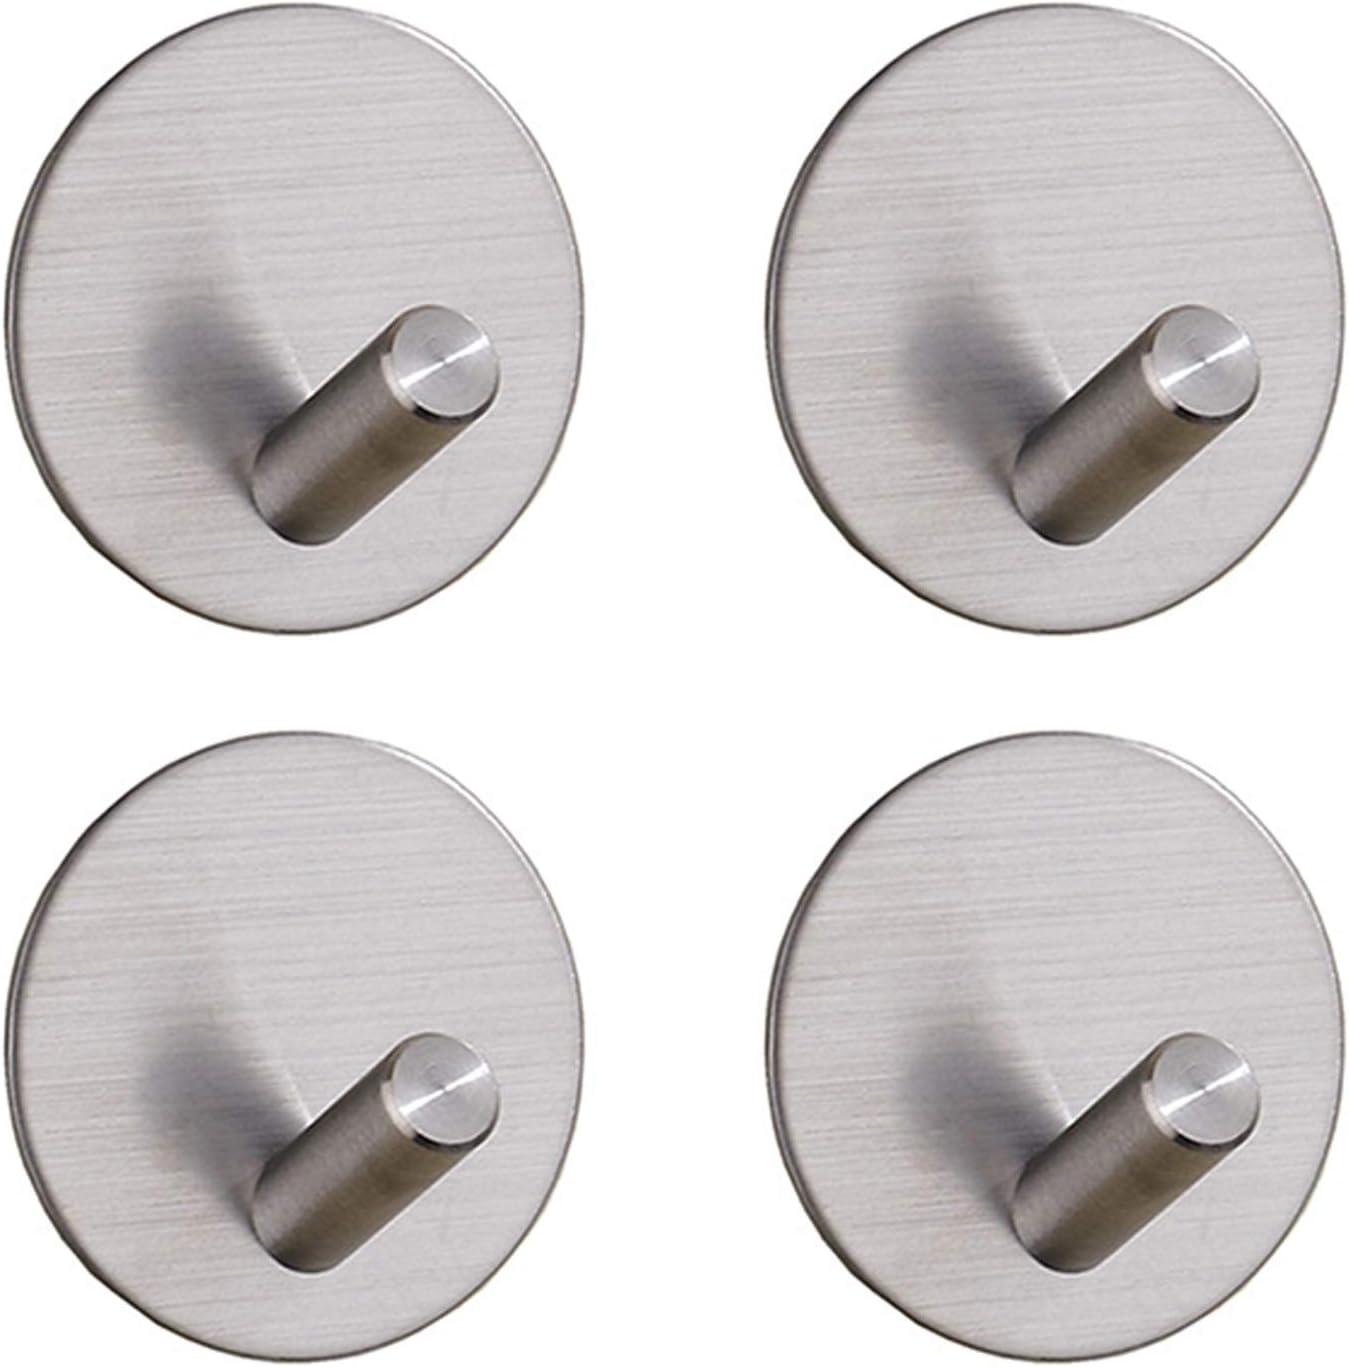 YOR Self-Adhesive Hooks Towel Stainless 55% Special price OFF Holder Steel Hook